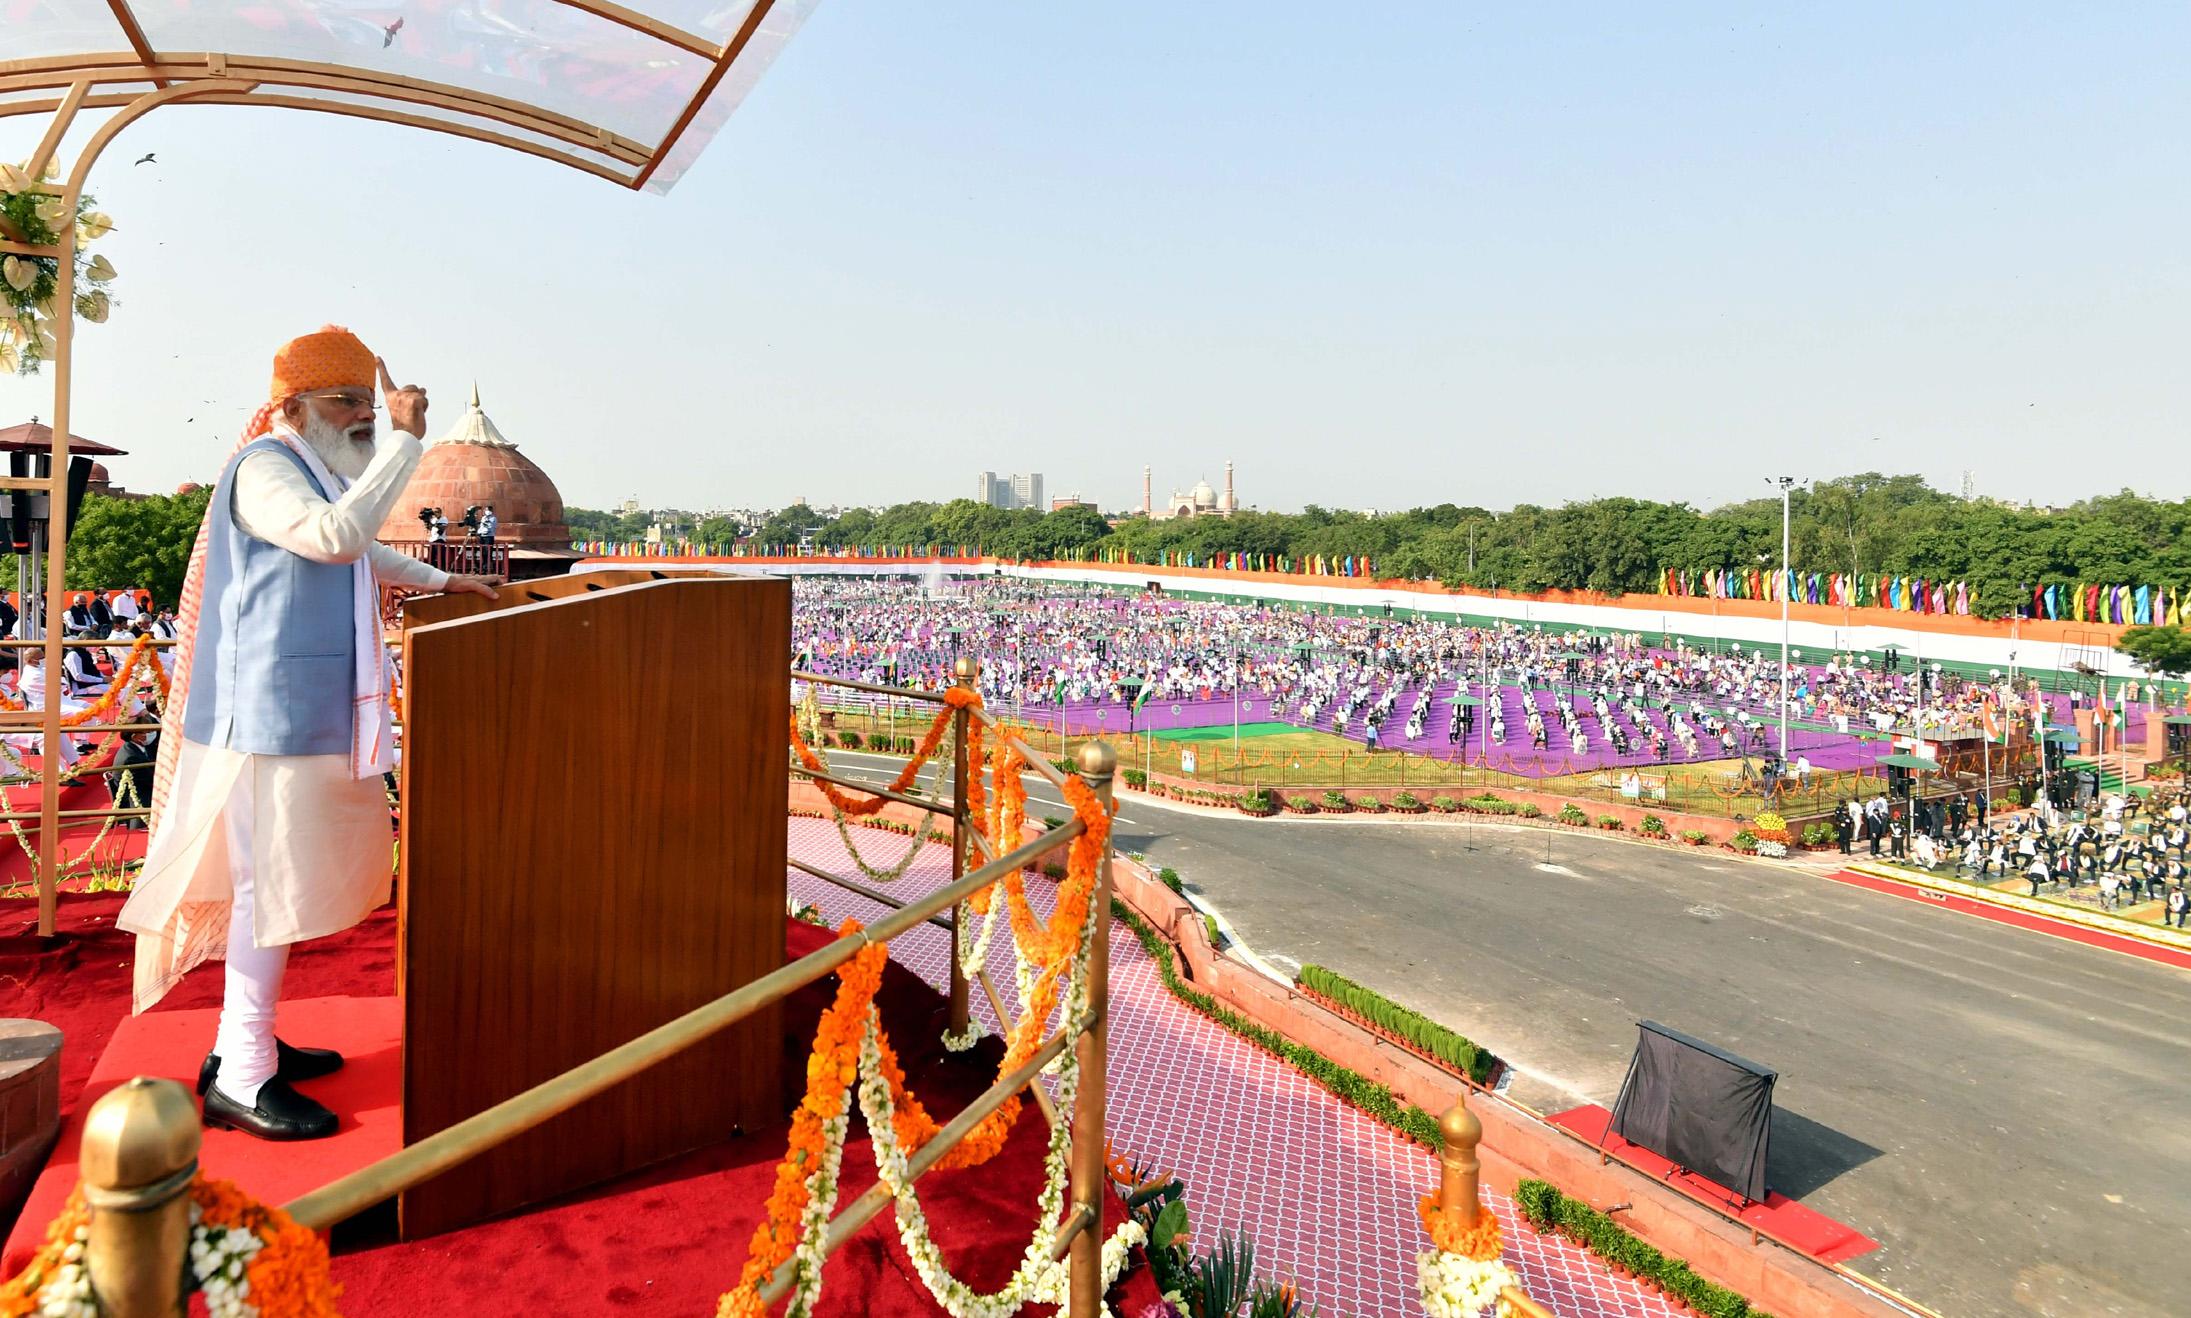 PM announces Rs 100 lakh-crore Gati Shakti national infrastructure plan